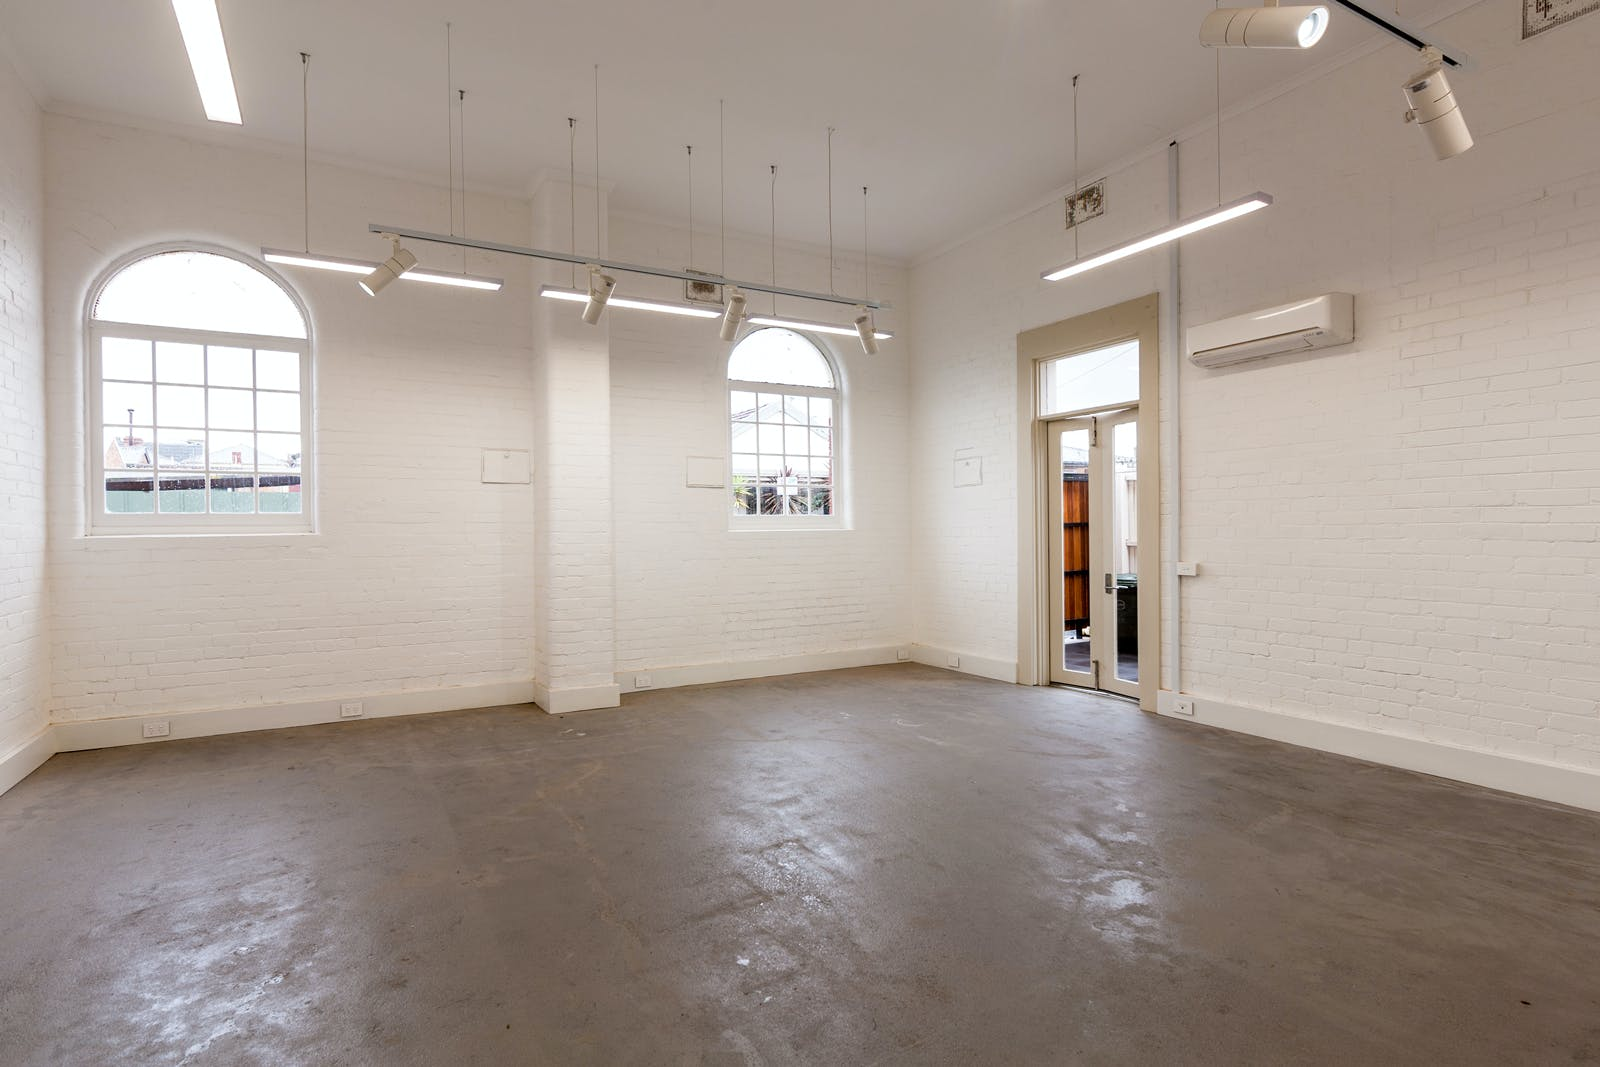 Seacombe Studio, function room at 75 Reid Street, image 1